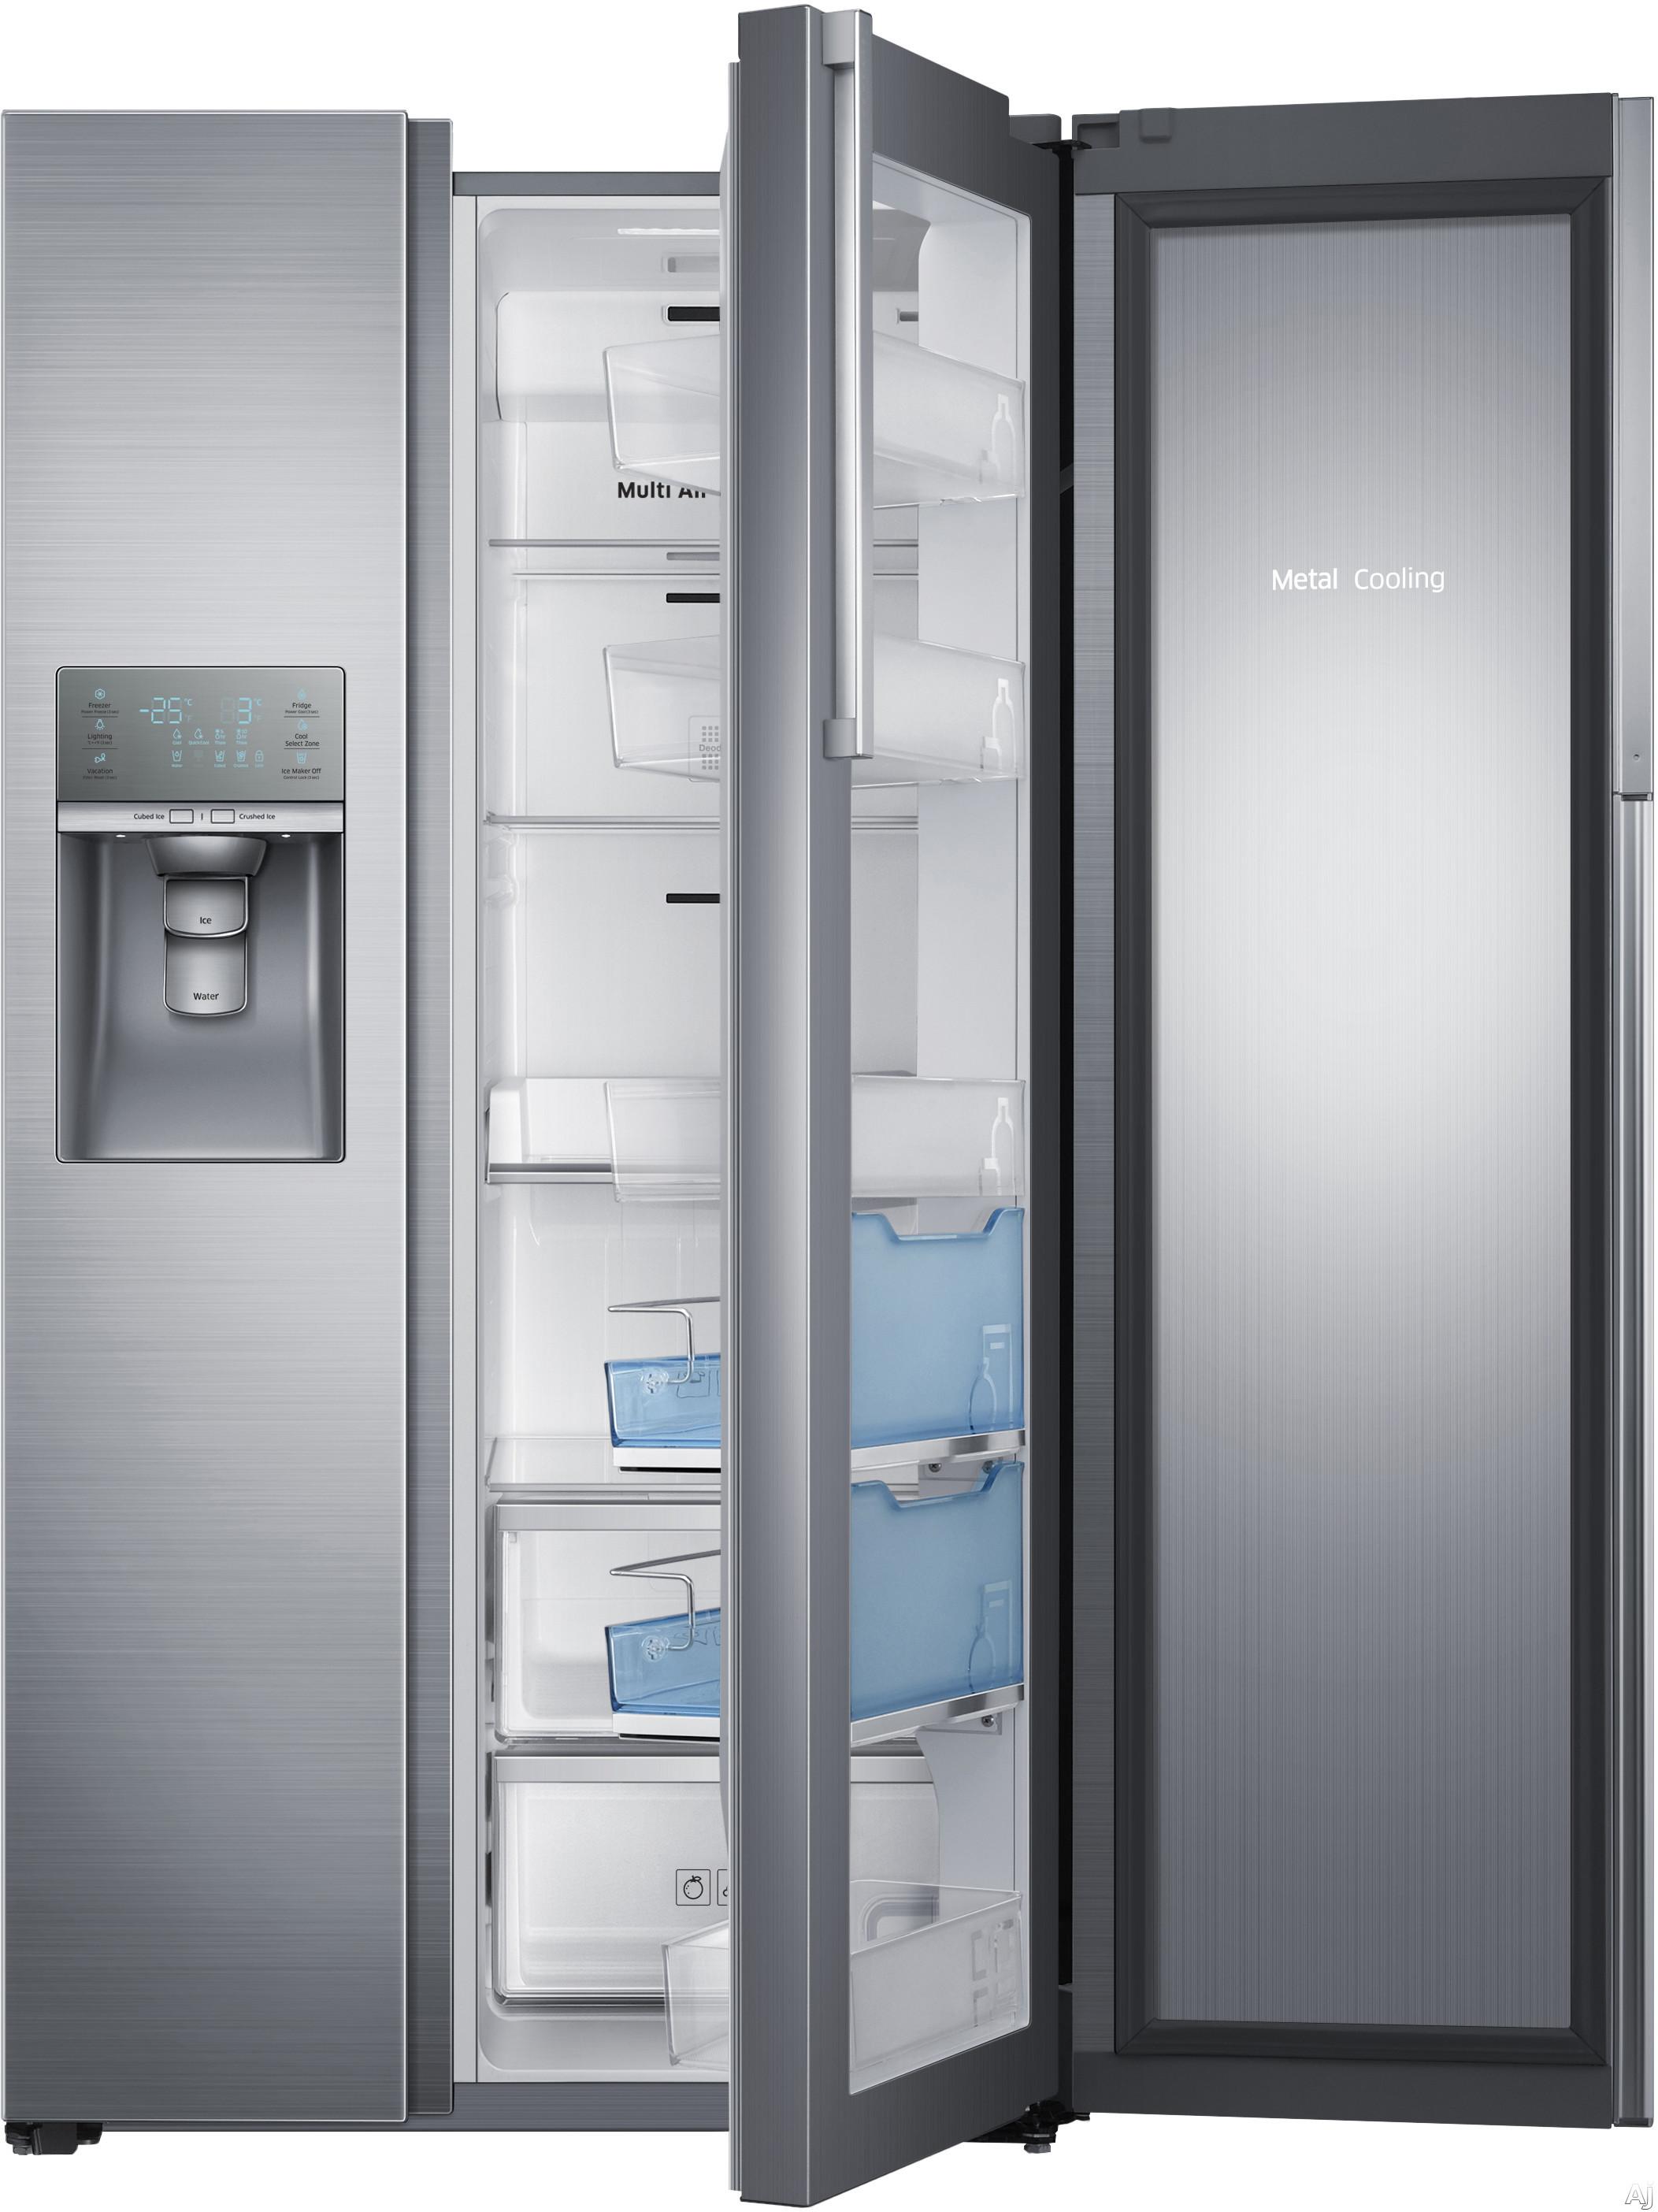 Refrigerator with 4 Tempered Glass Shelves, Food ShowCase Fridge Door ...